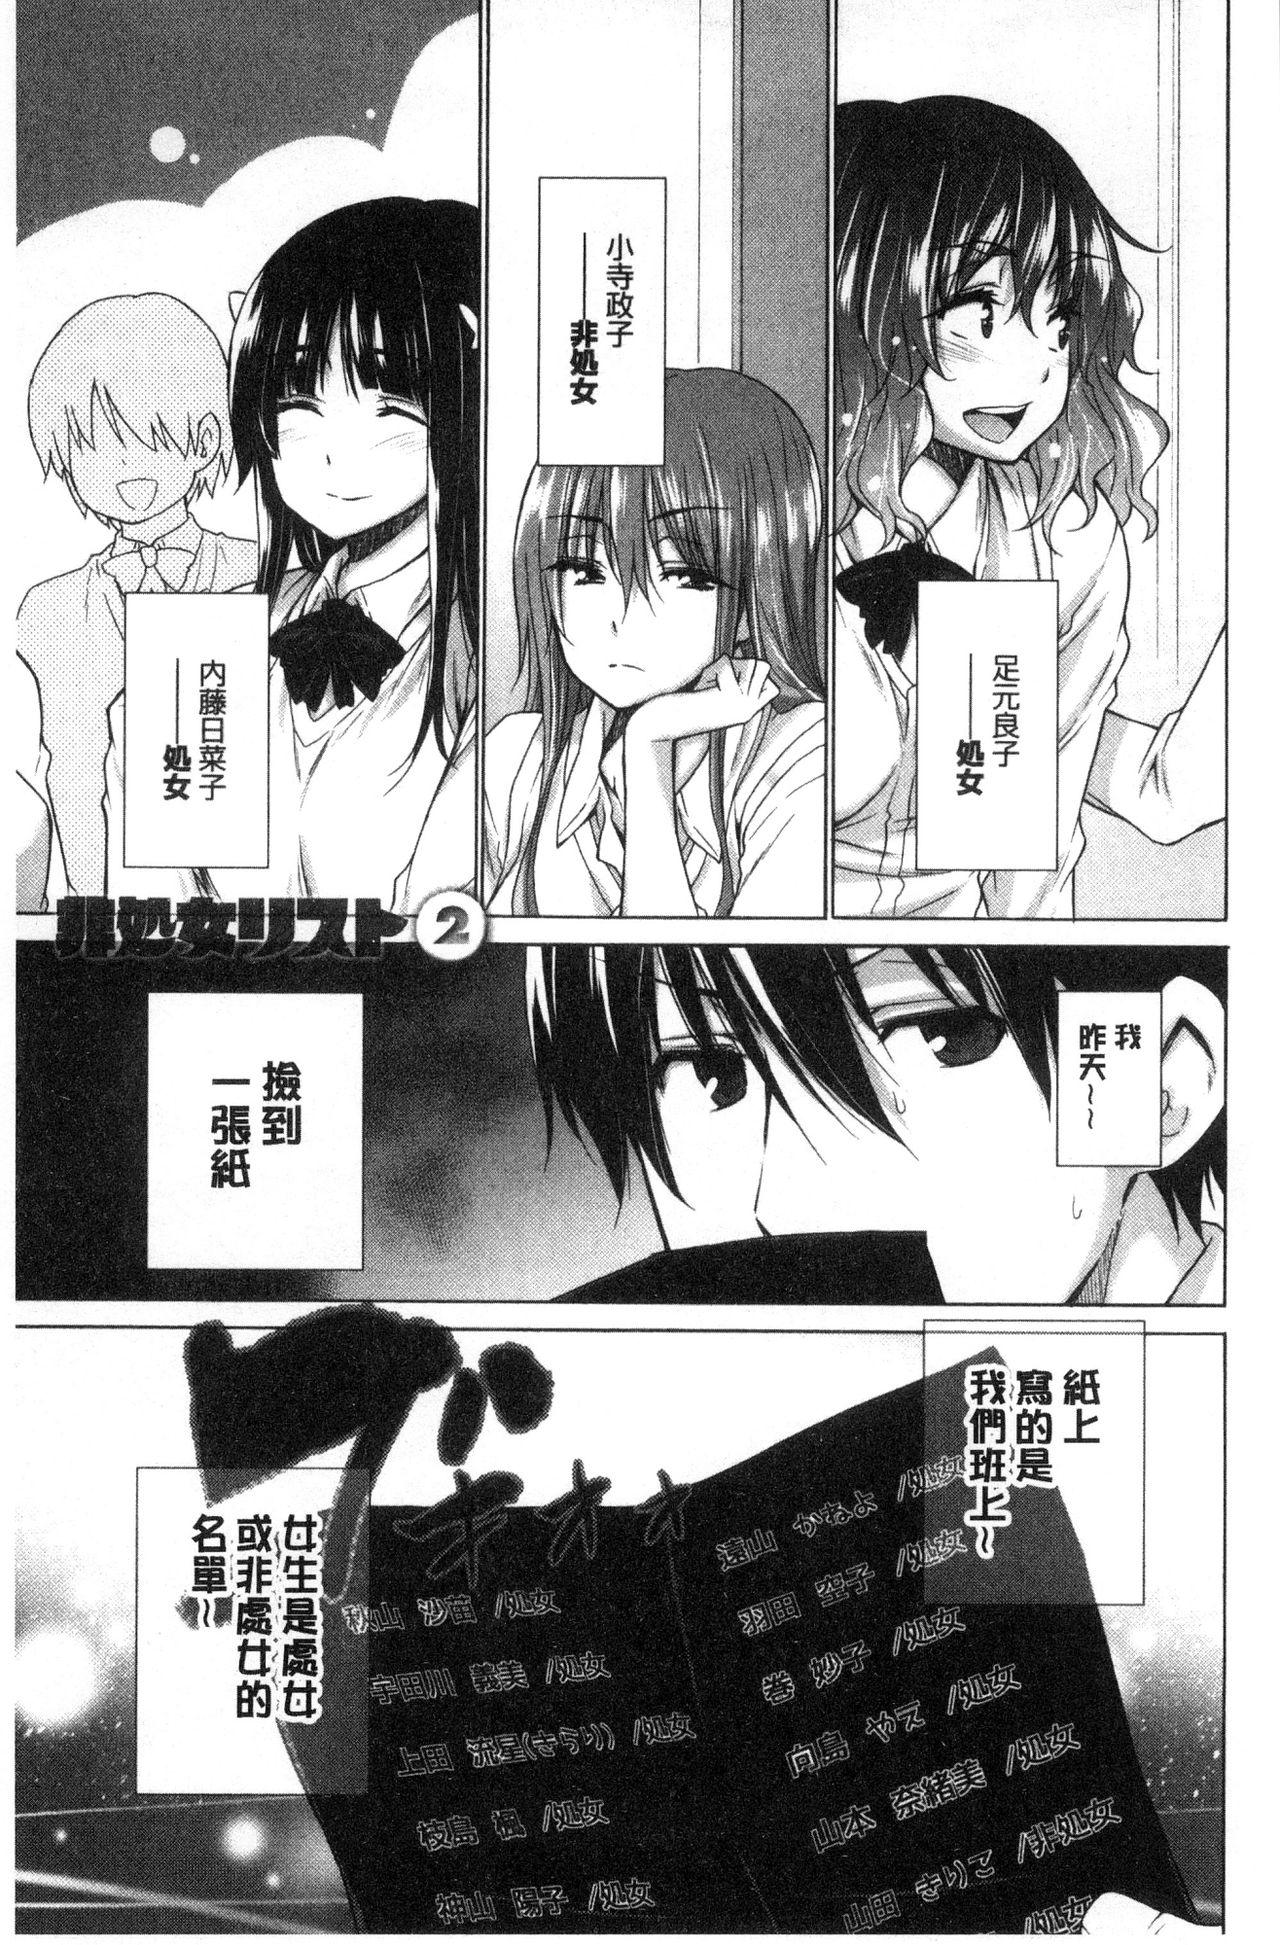 [Miyano Kintarou] Hishoujo List - The Non-Virgin List  | 非處女的名單 [Chinese] 26